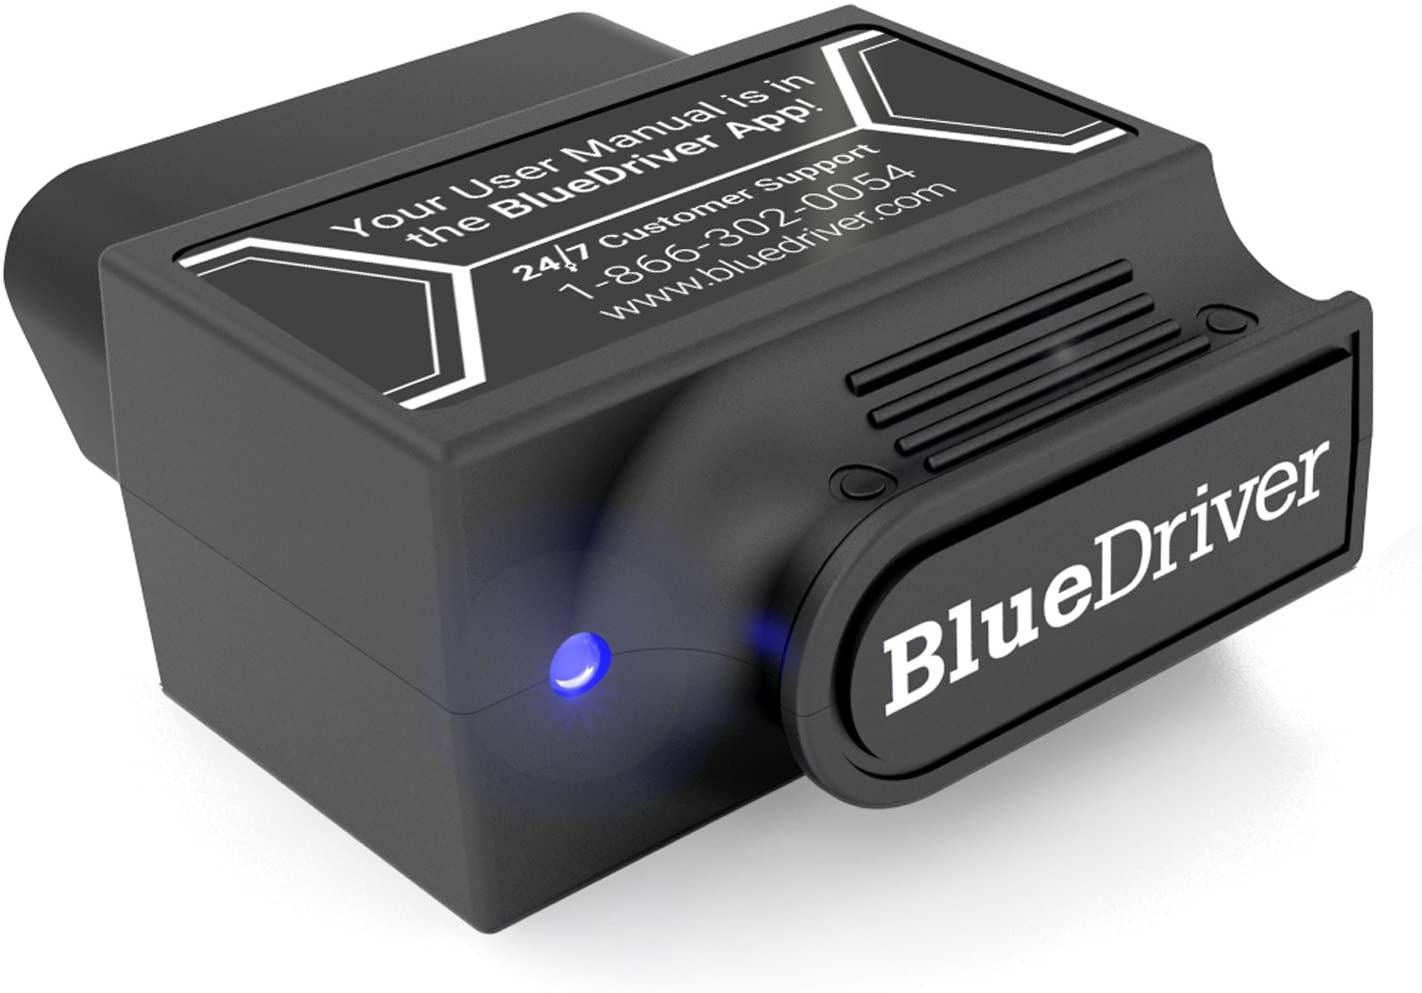 A BlueDriver Bluetooth monitor